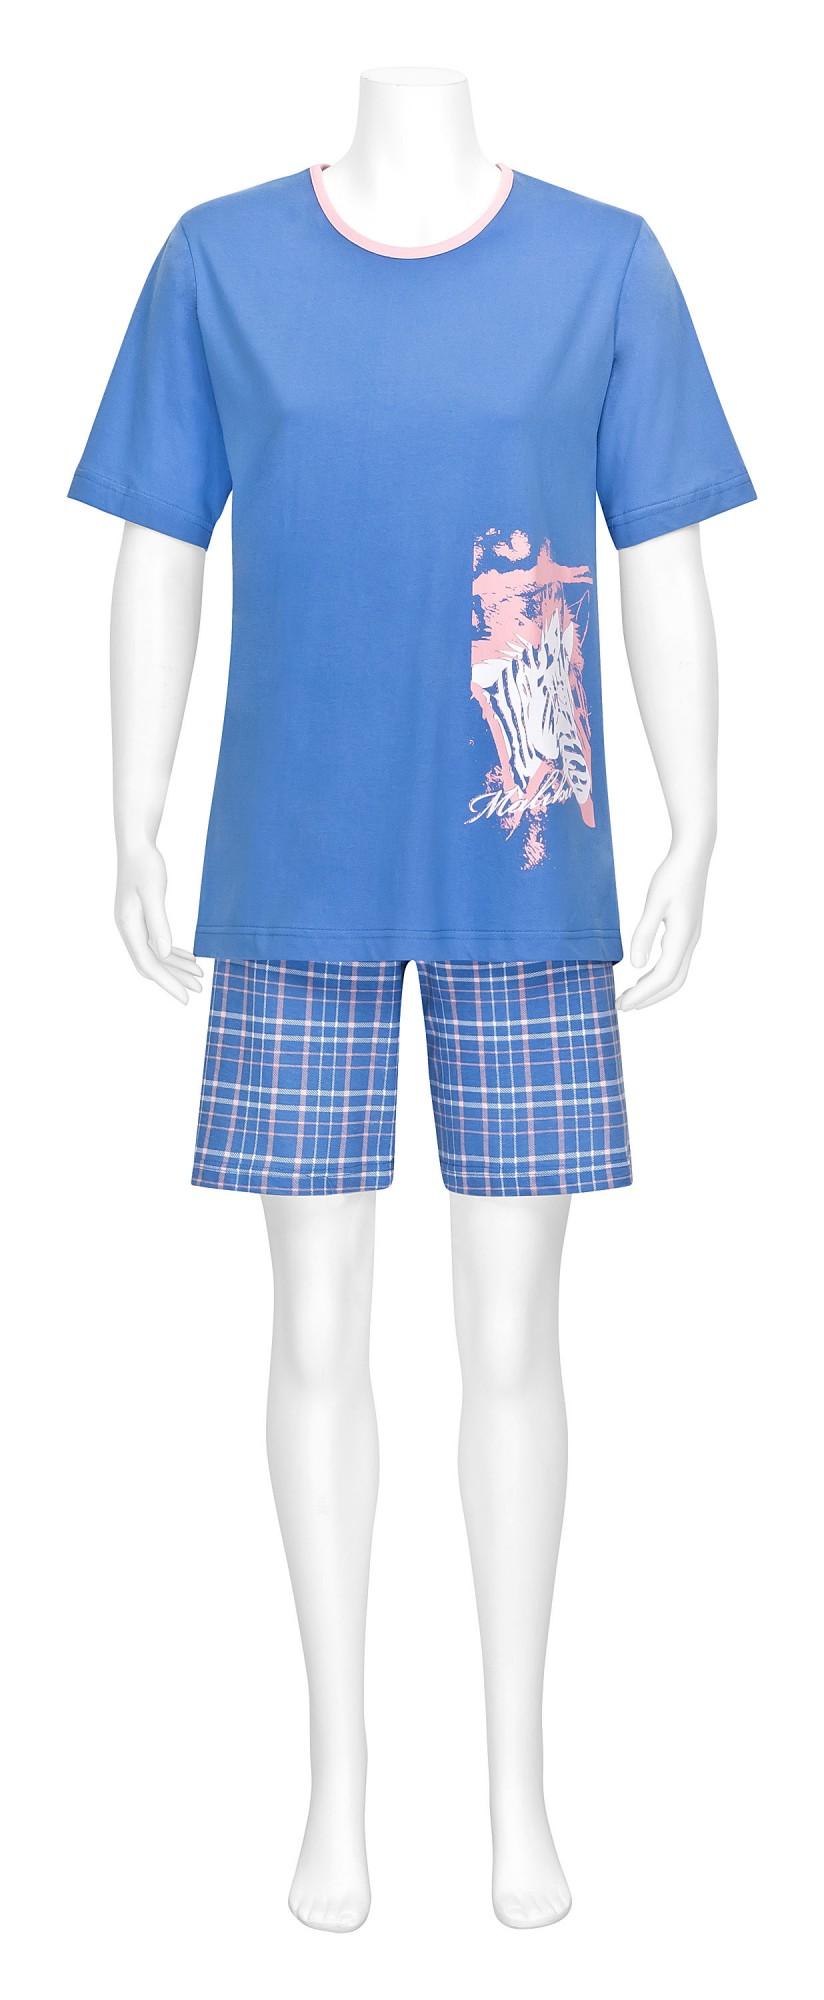 Damen Pyjama Shortie kurzarm mit Animalprint und karierter kurzer Hose – 57210